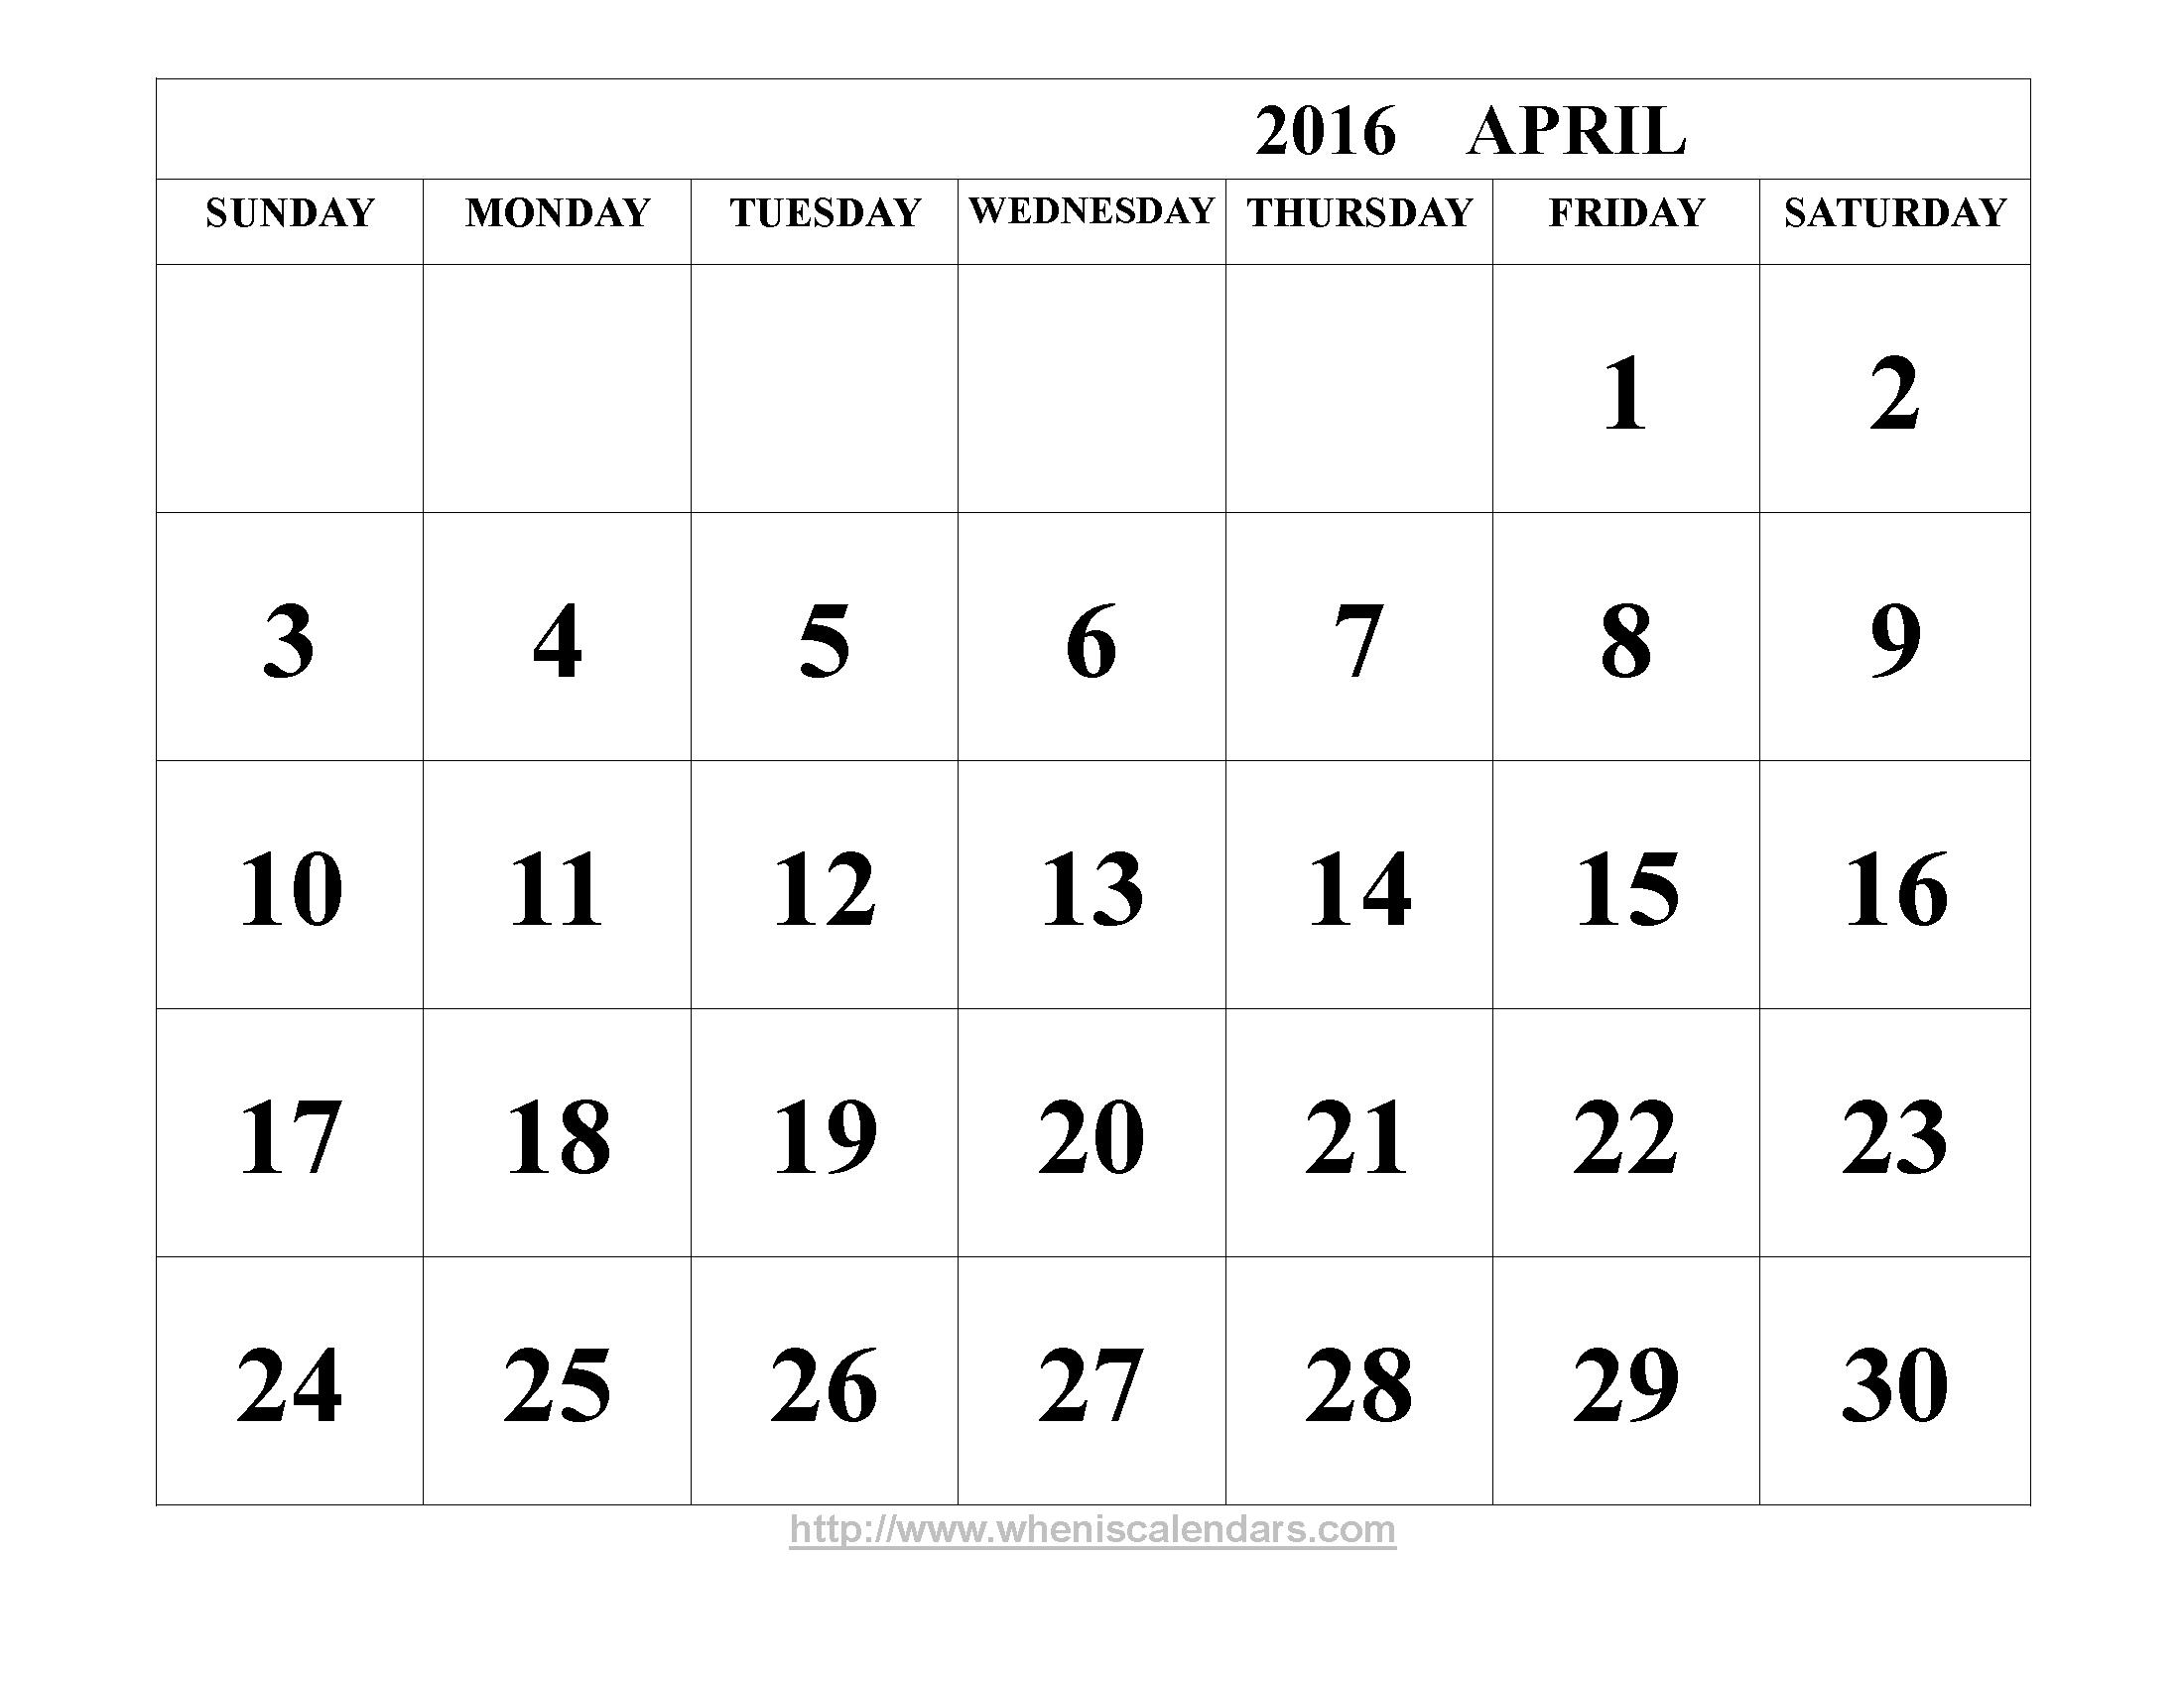 April 2016 Calendar Printable Template Word PDF Image